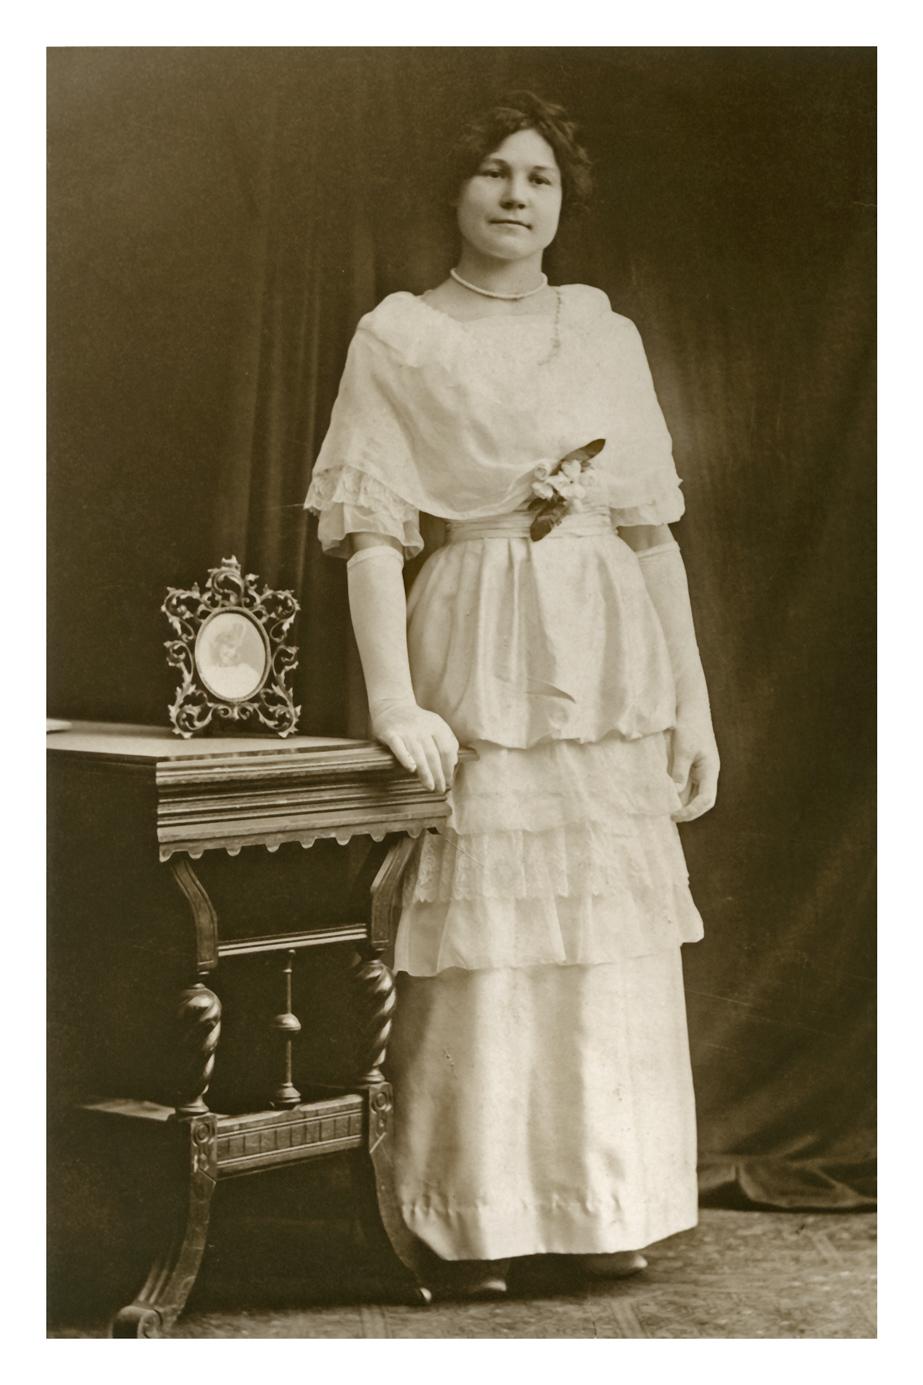 Helena Chmielewska - 1916